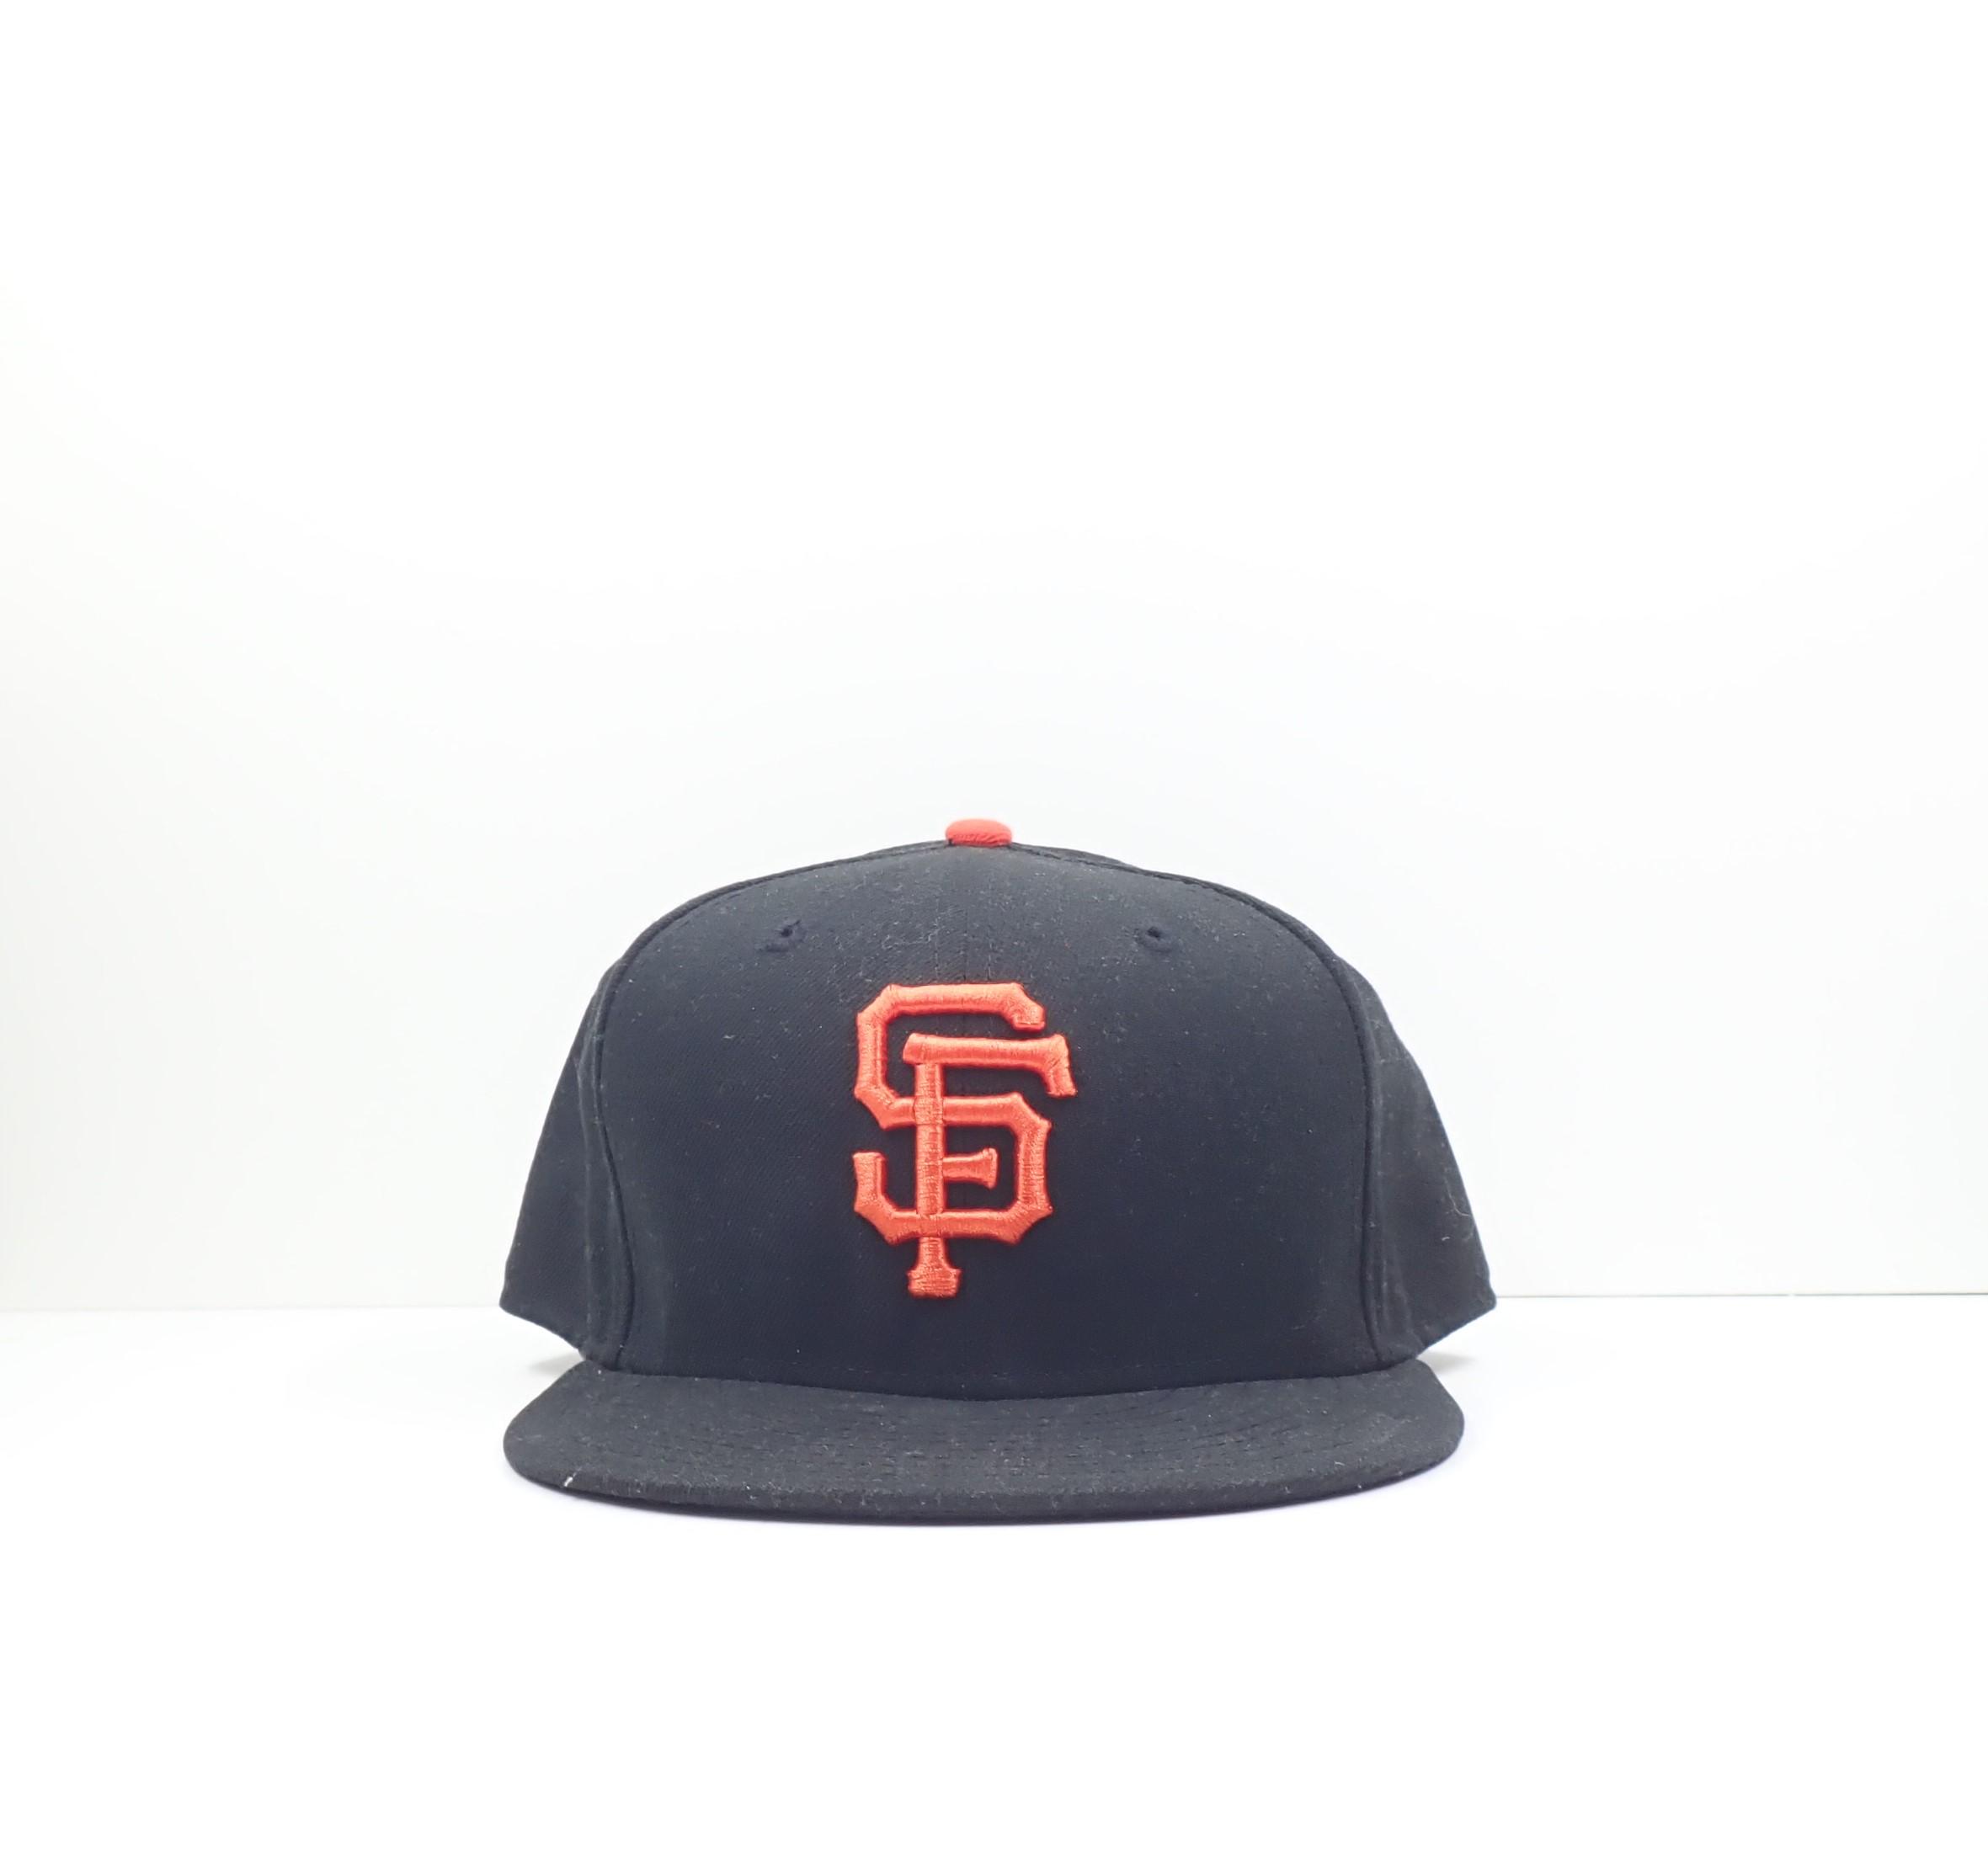 San Francisco Giants New era 59Fifty Cap